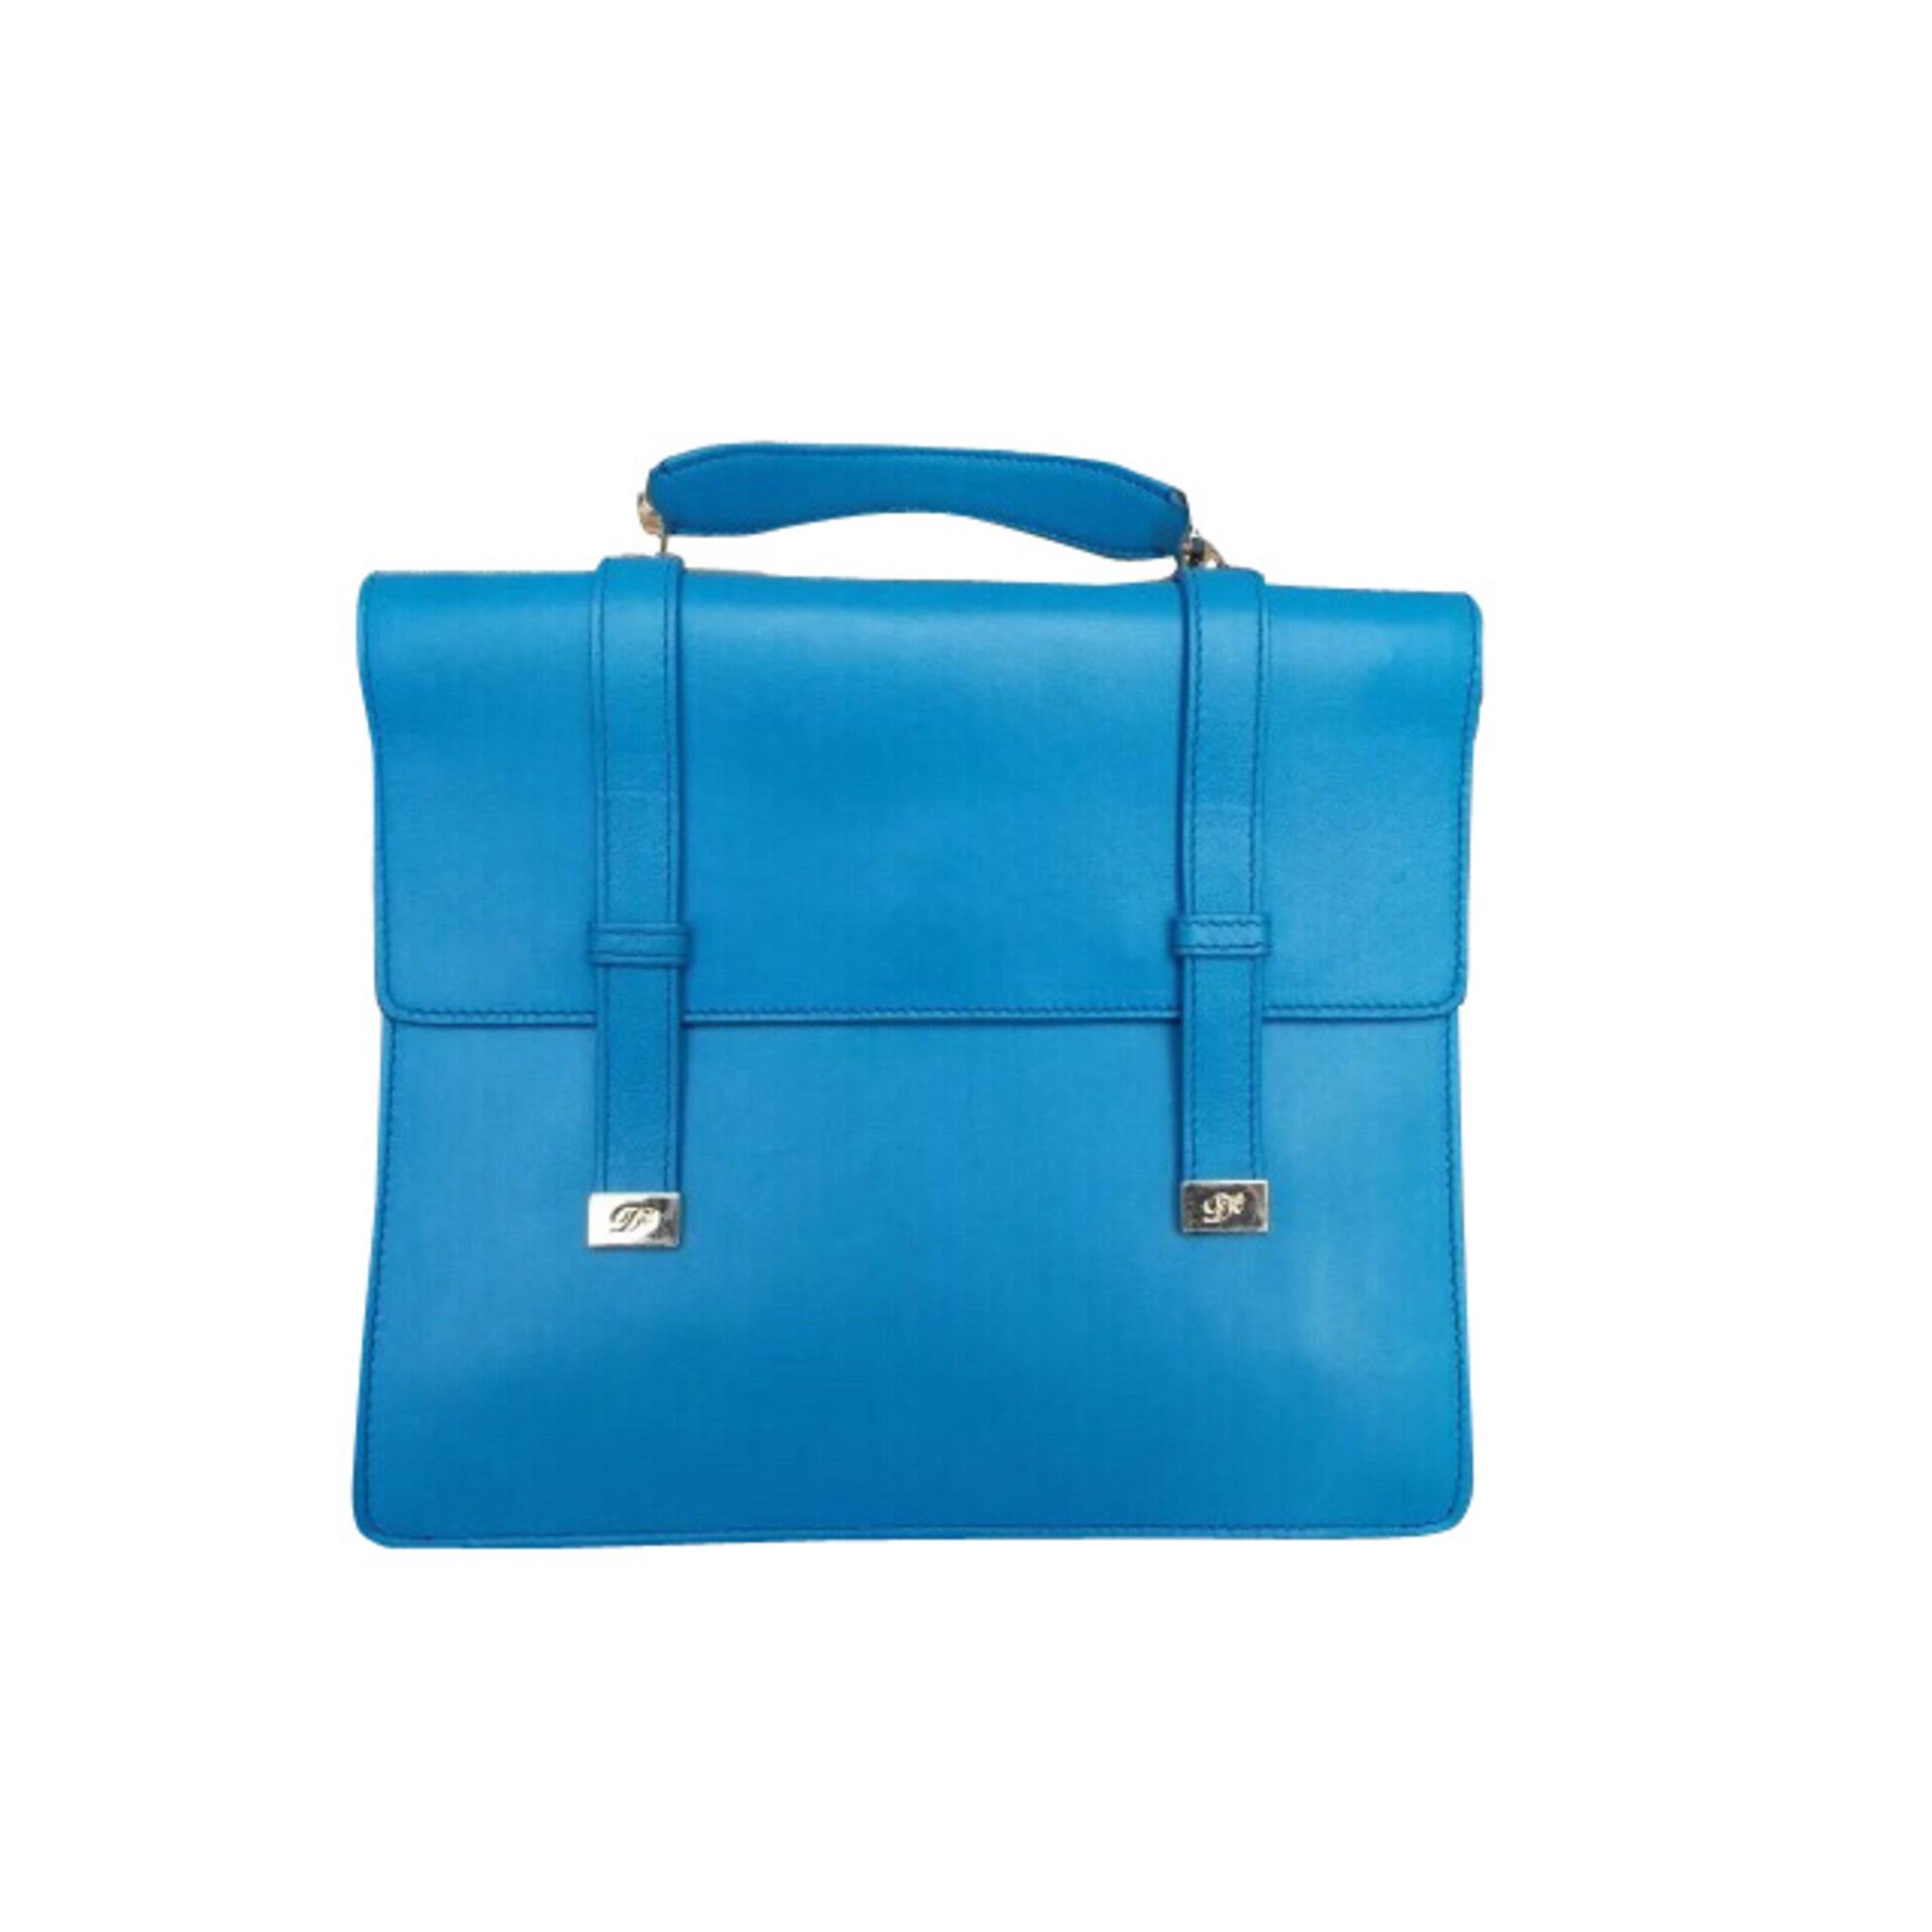 95fe26223c Sac à main en cuir DSQUARED2 Bleu, bleu marine, bleu turquoise